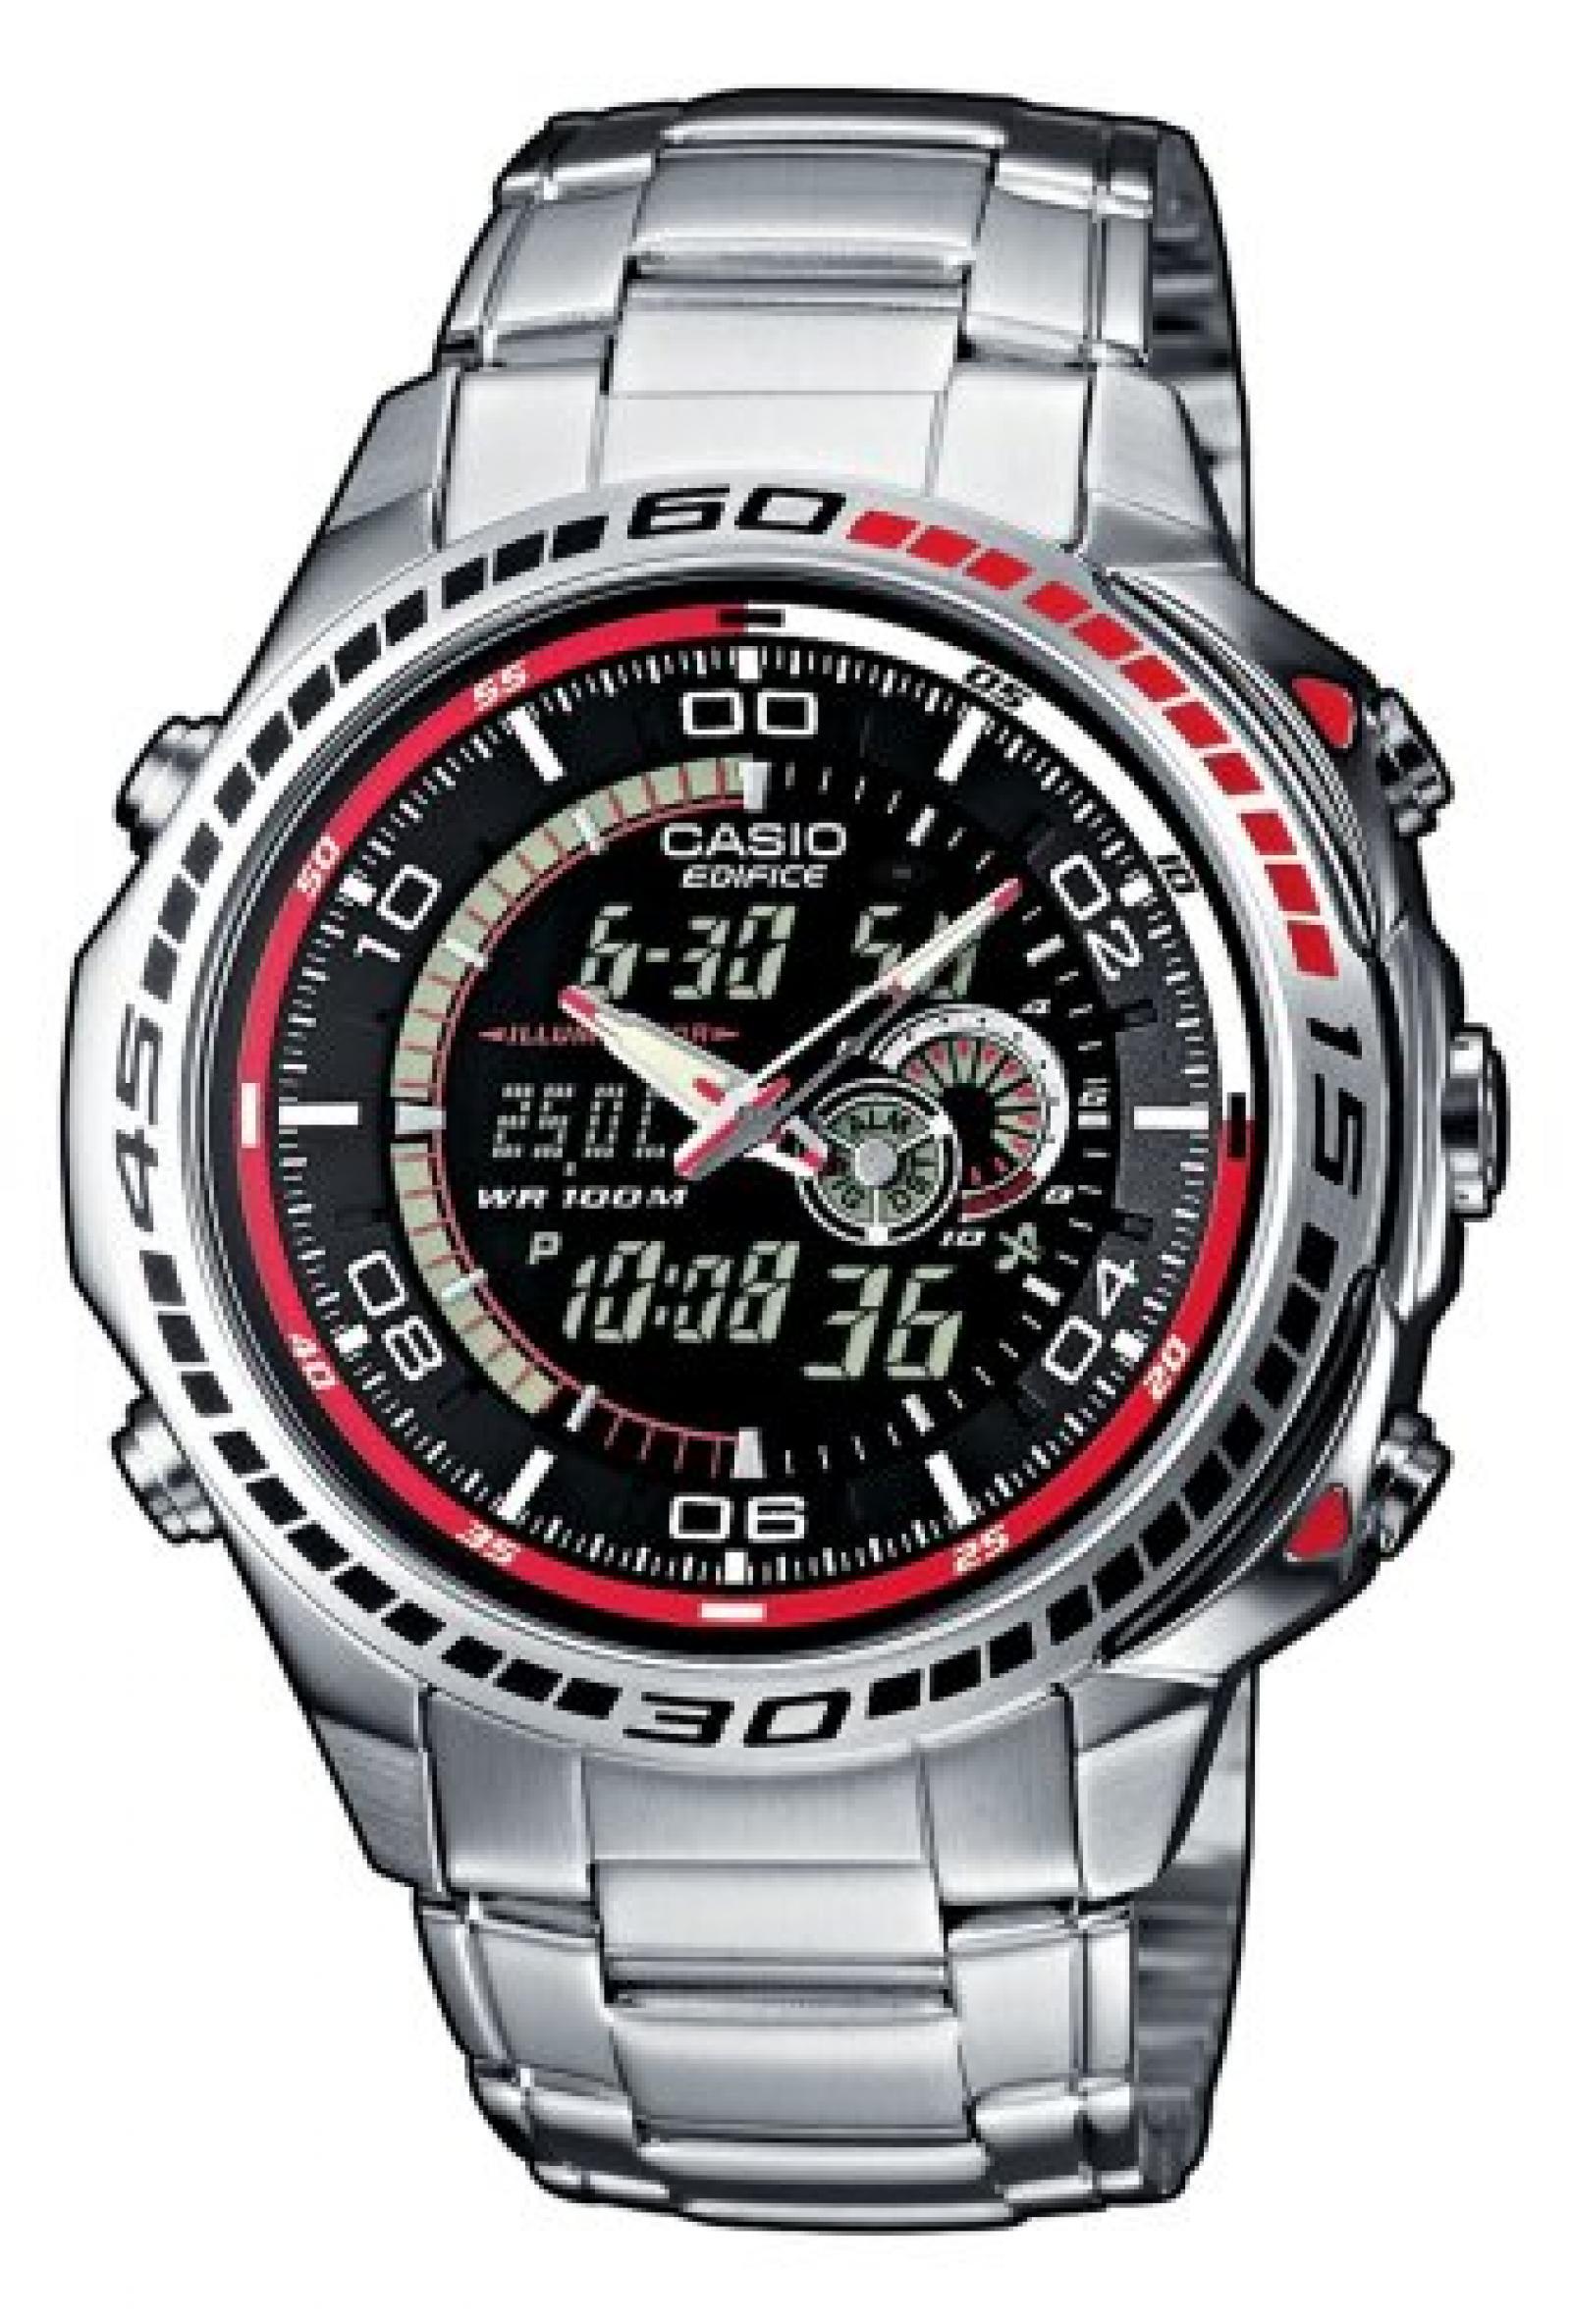 Casio Edifice Herren-Armbanduhr Analog / Digital Quarz EFA-121D-1AVEF